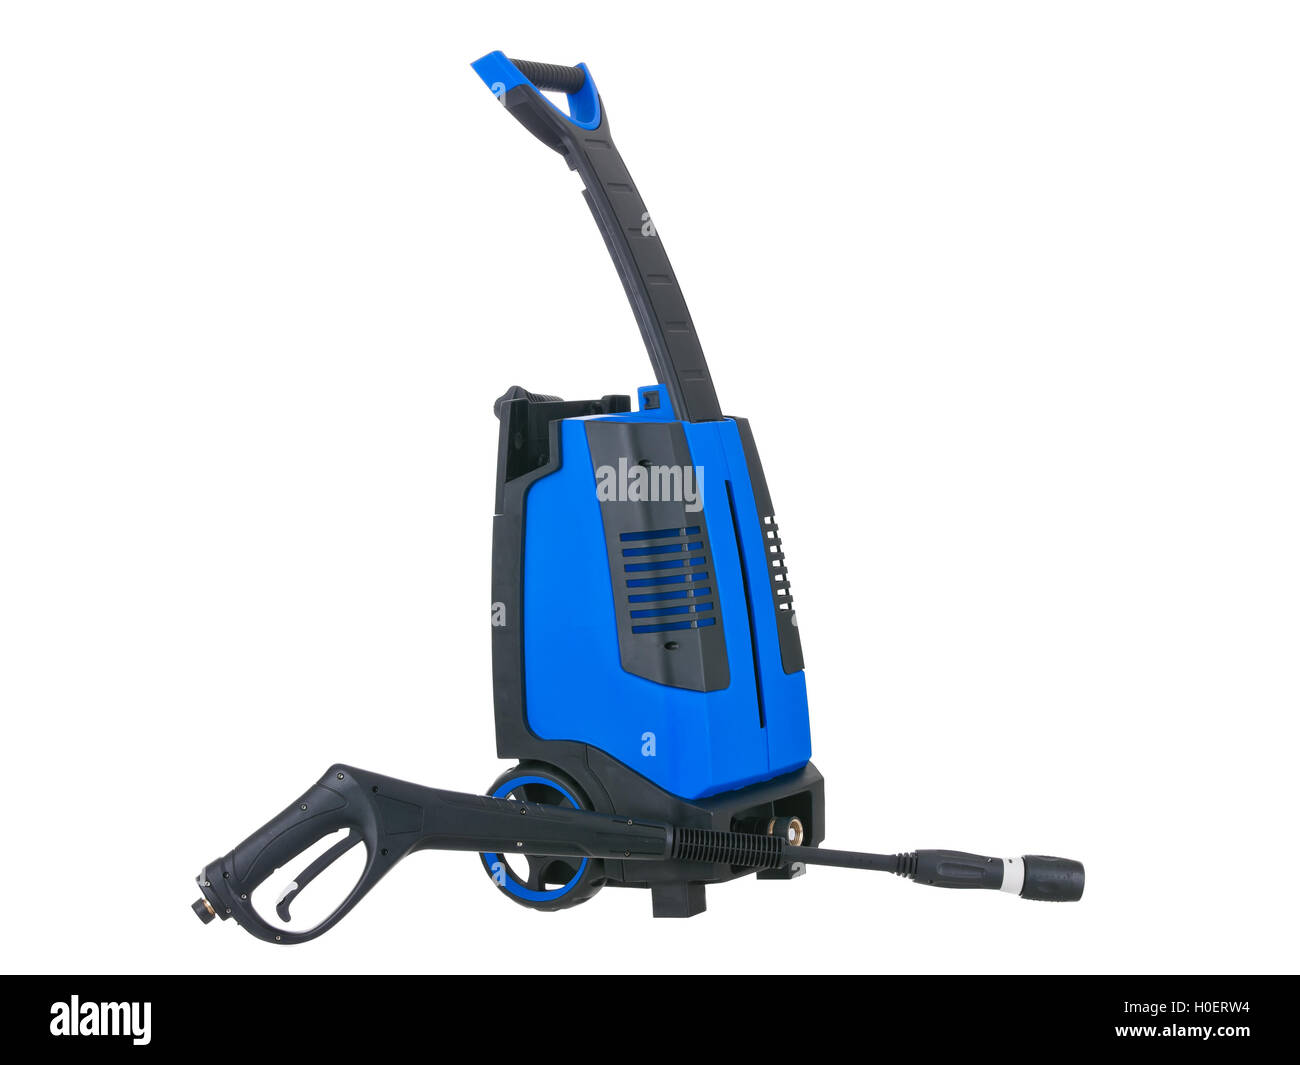 Blue pressure portable washer gun down on pure white background - Stock Image